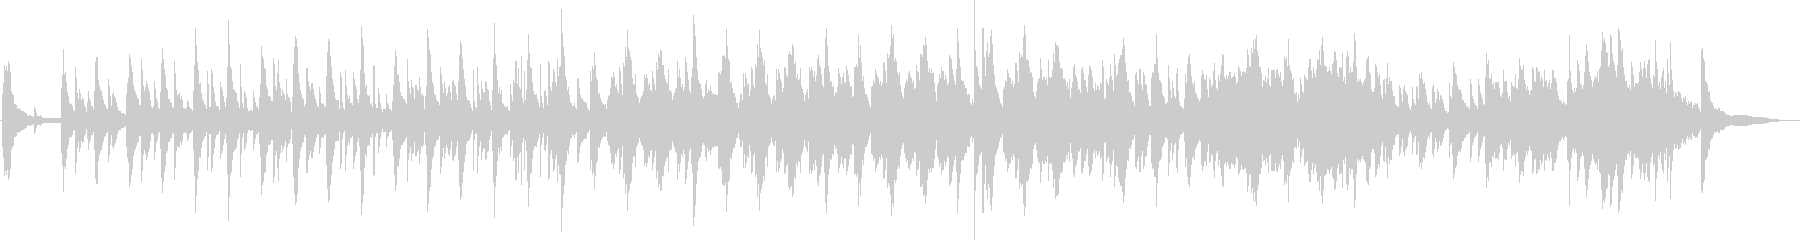 Piano フルート 癒し系 ヒーリングの未再生の波形